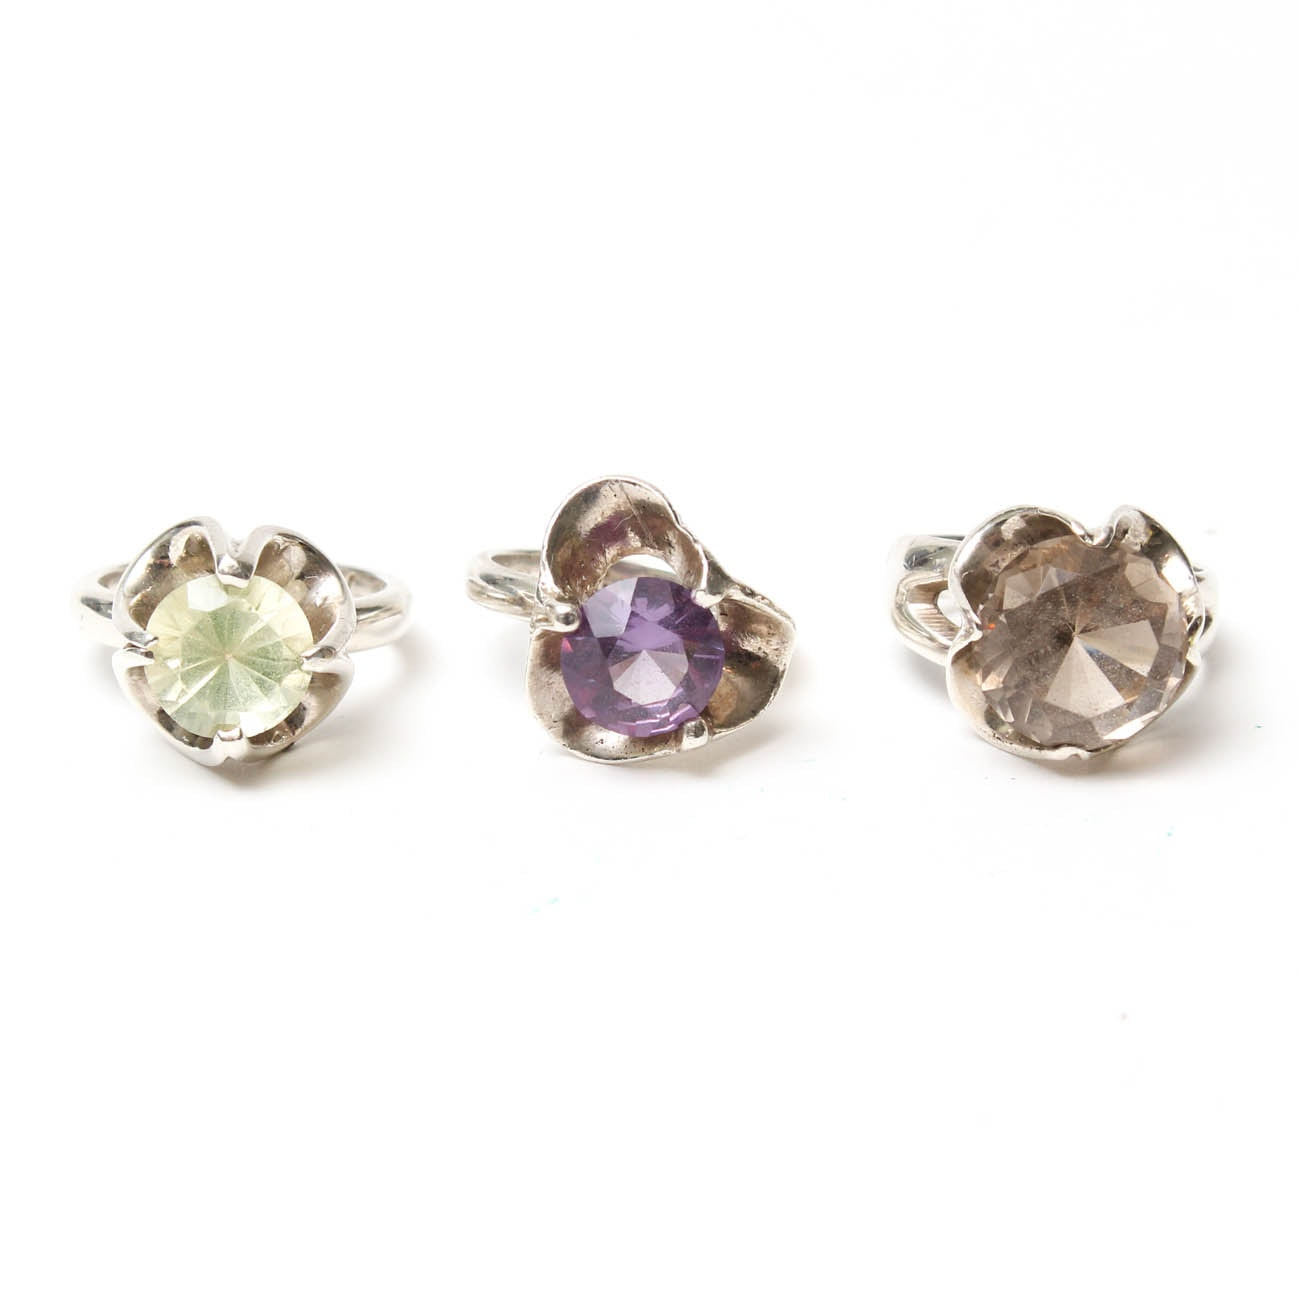 Vintage Sterling Silver Rings with Gemstones